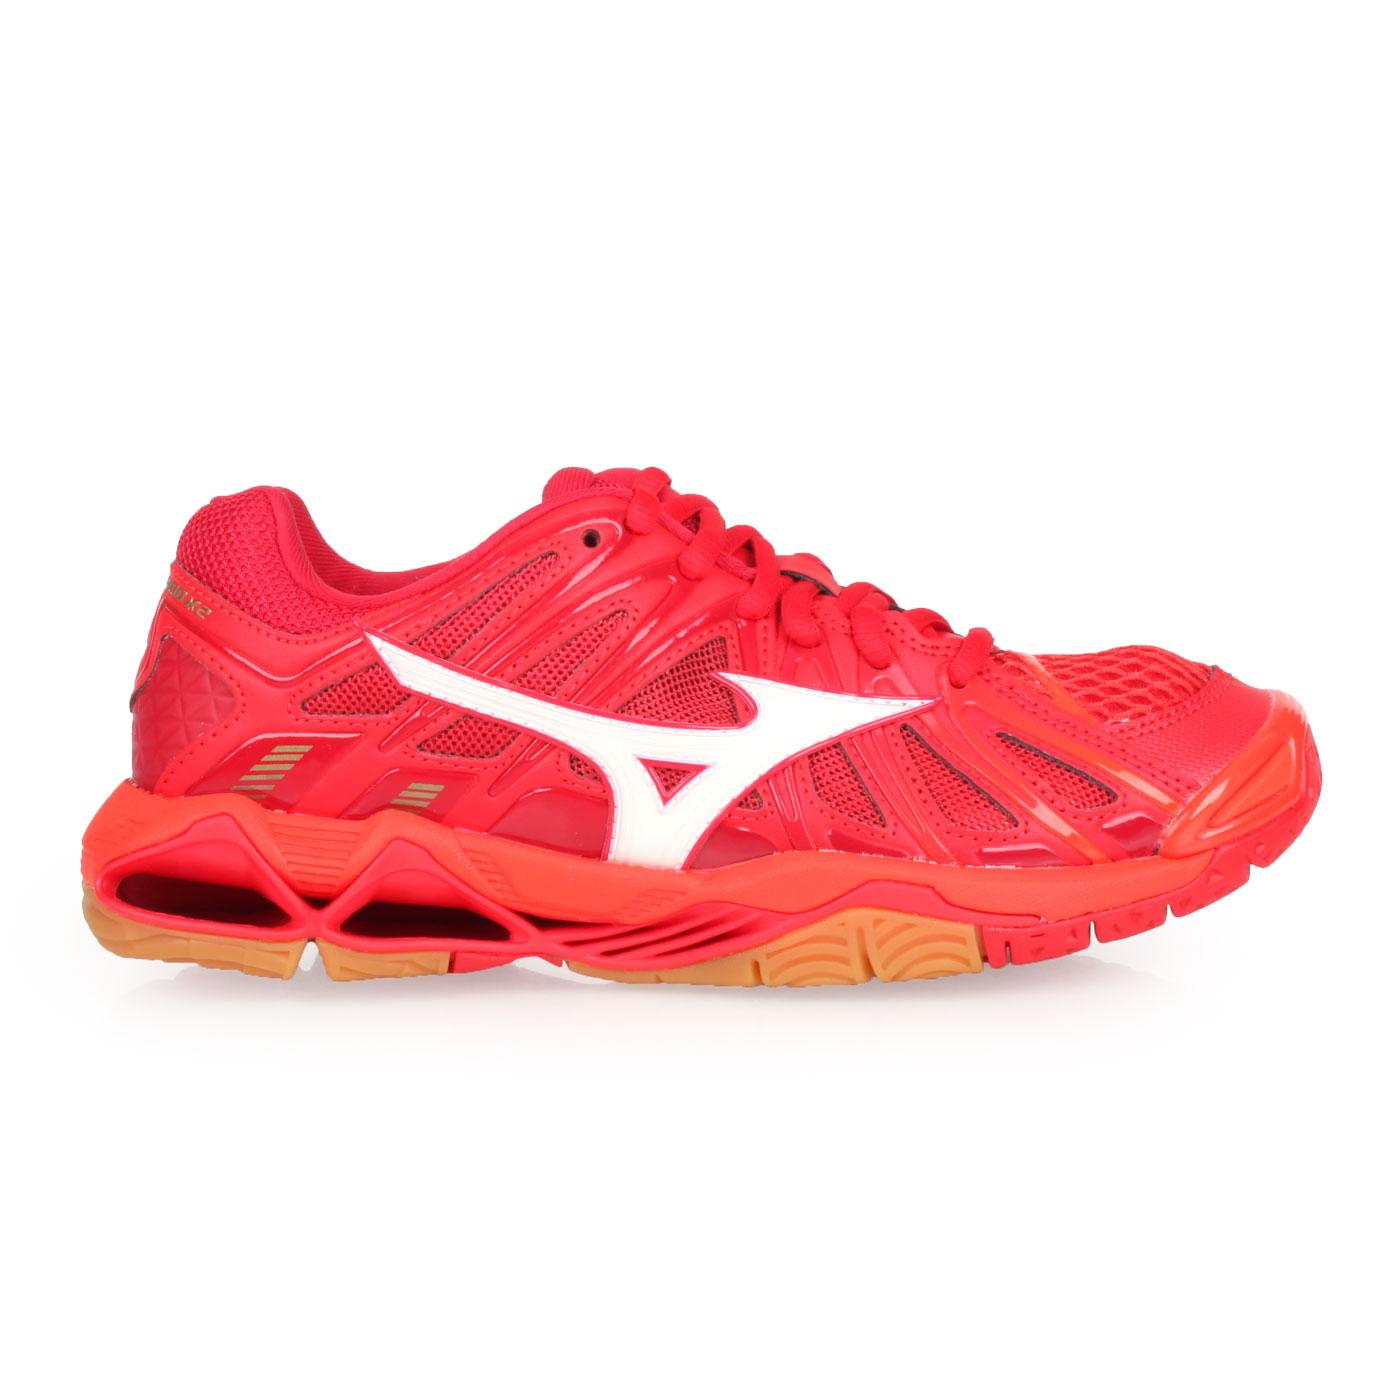 MIZUNO 排球鞋  @WAVE TORNADO X2@V1GA181251 - 橘紅白